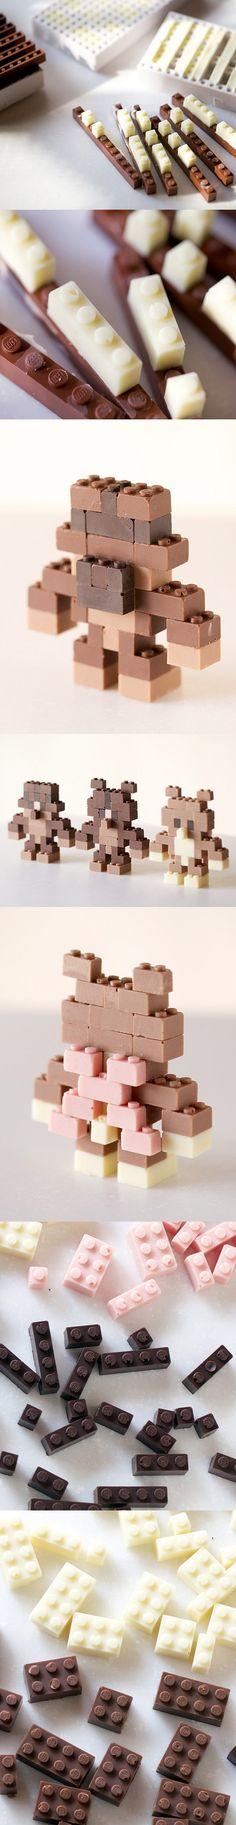 lego-chocolate-muy-ingenioso-1